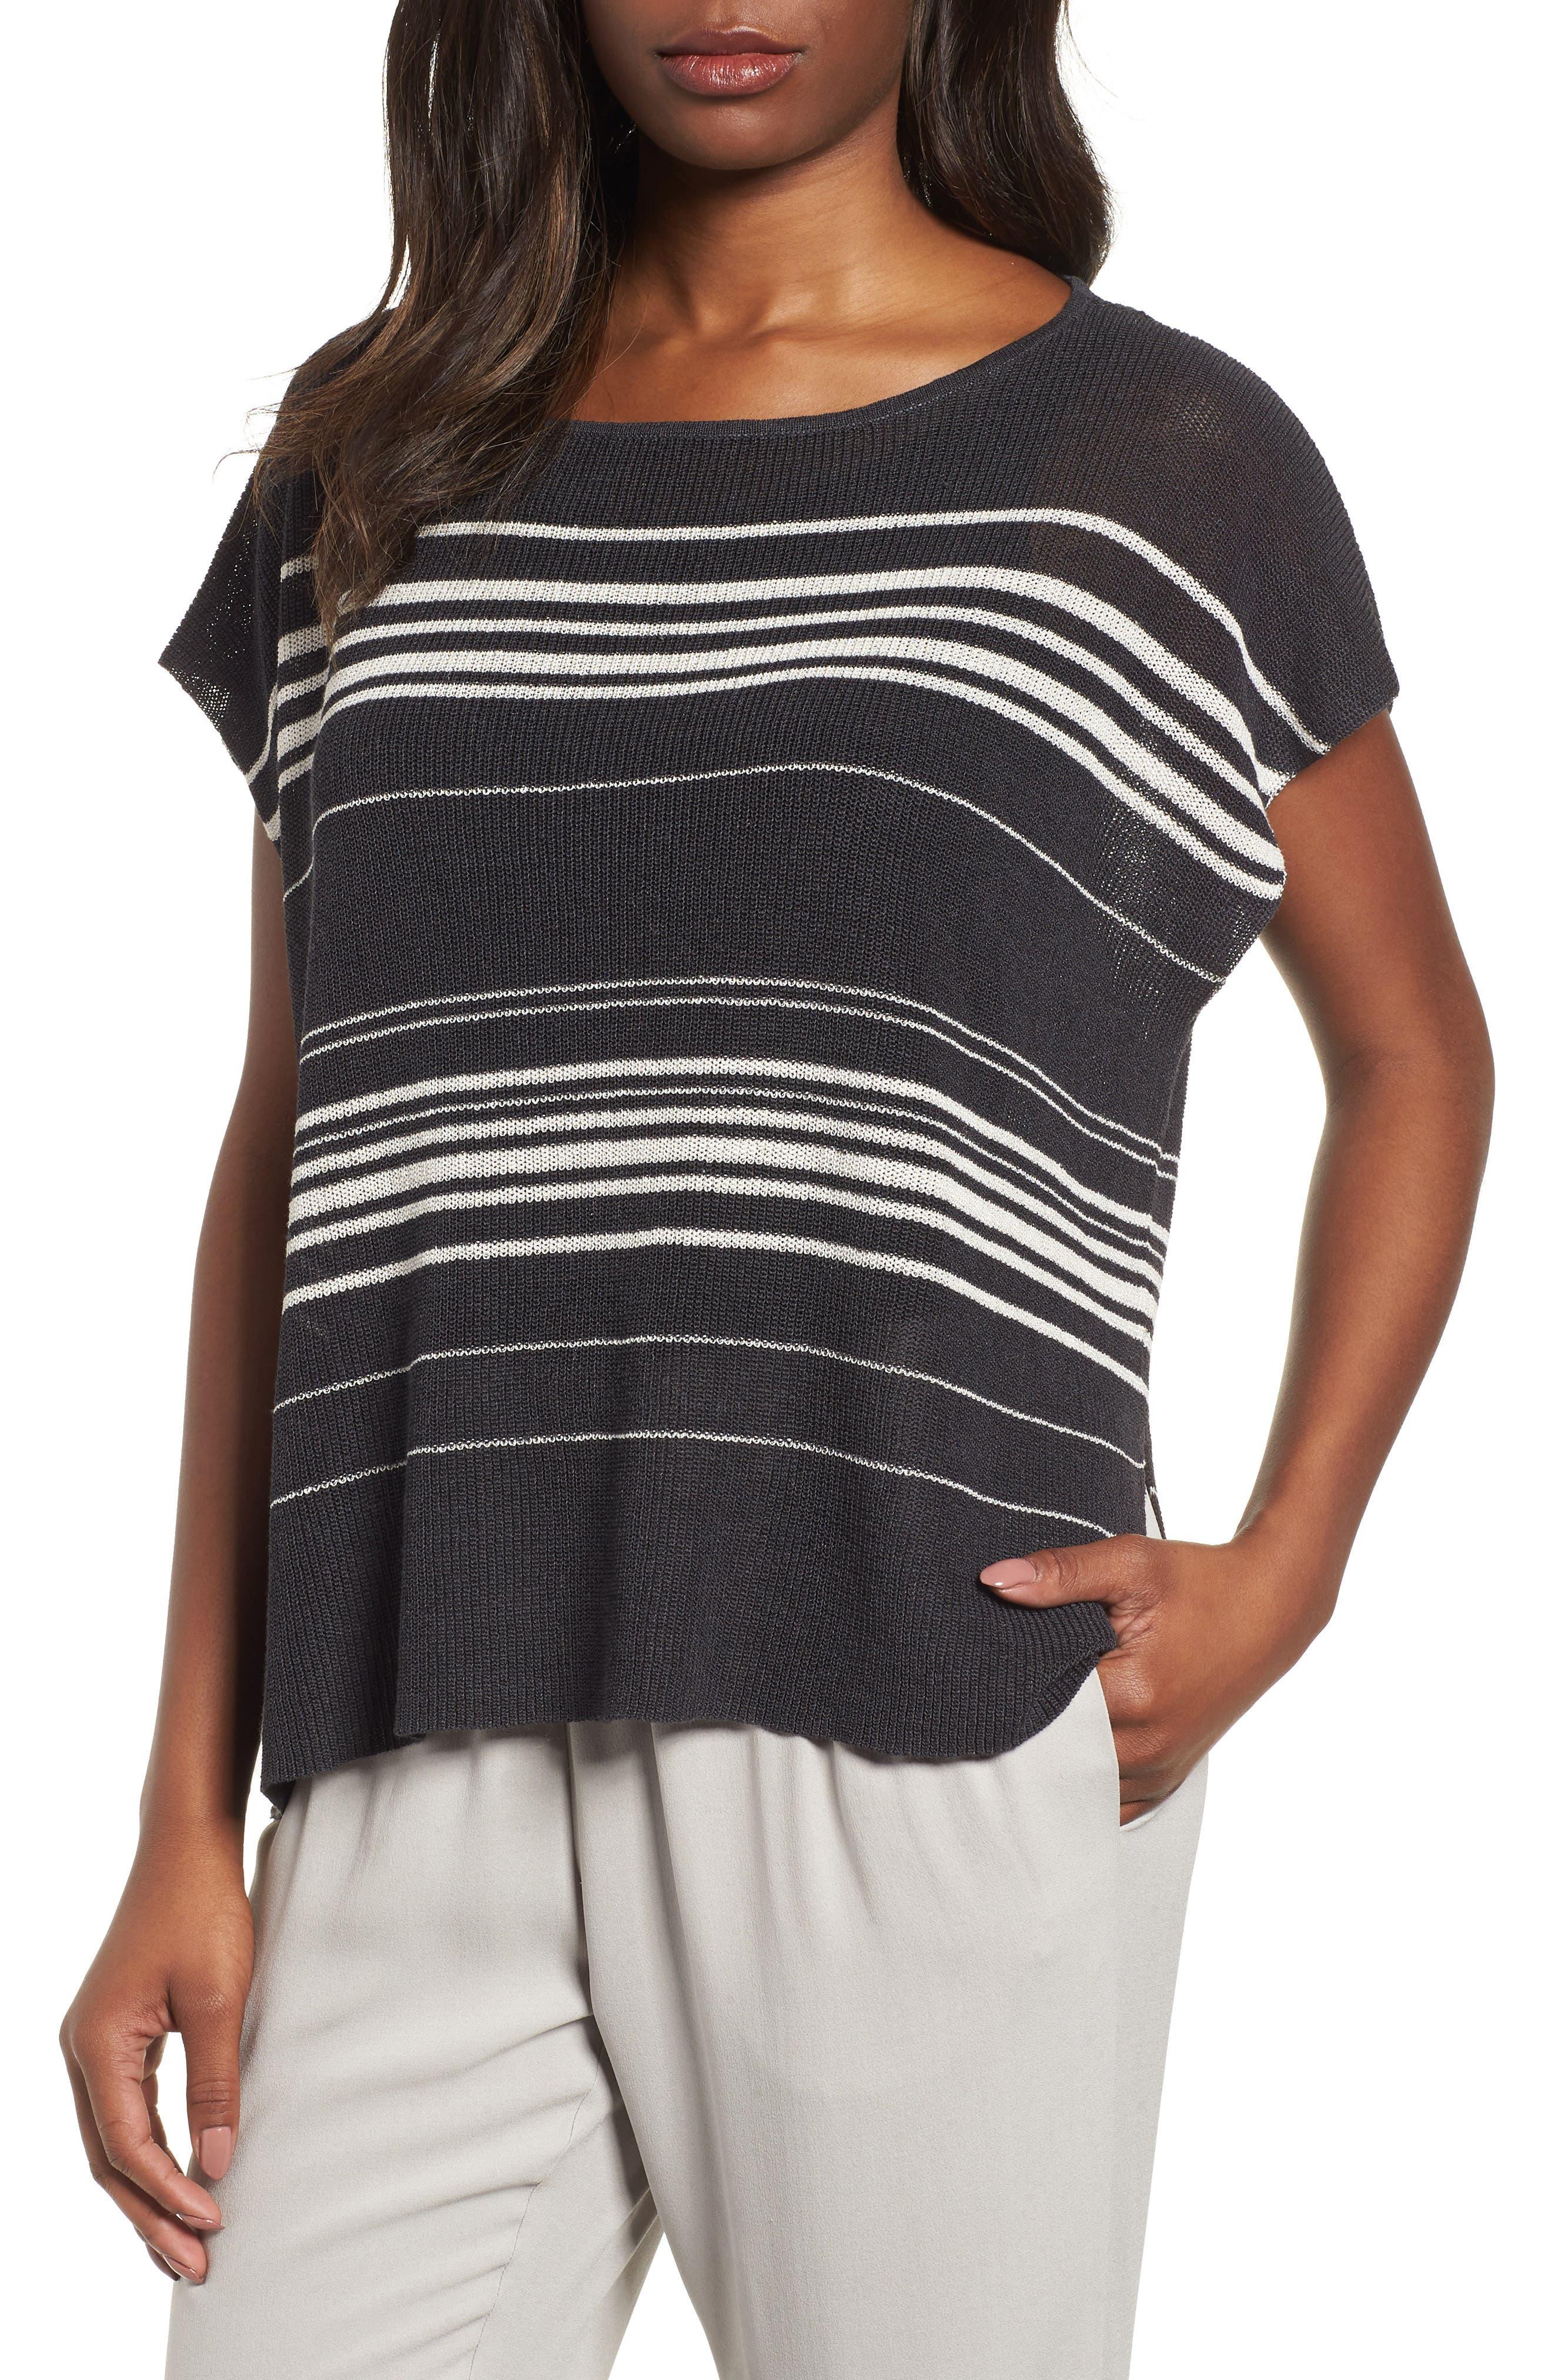 Organic Linen Blend Poncho Sweater,                             Main thumbnail 1, color,                             Graphite/ Bone